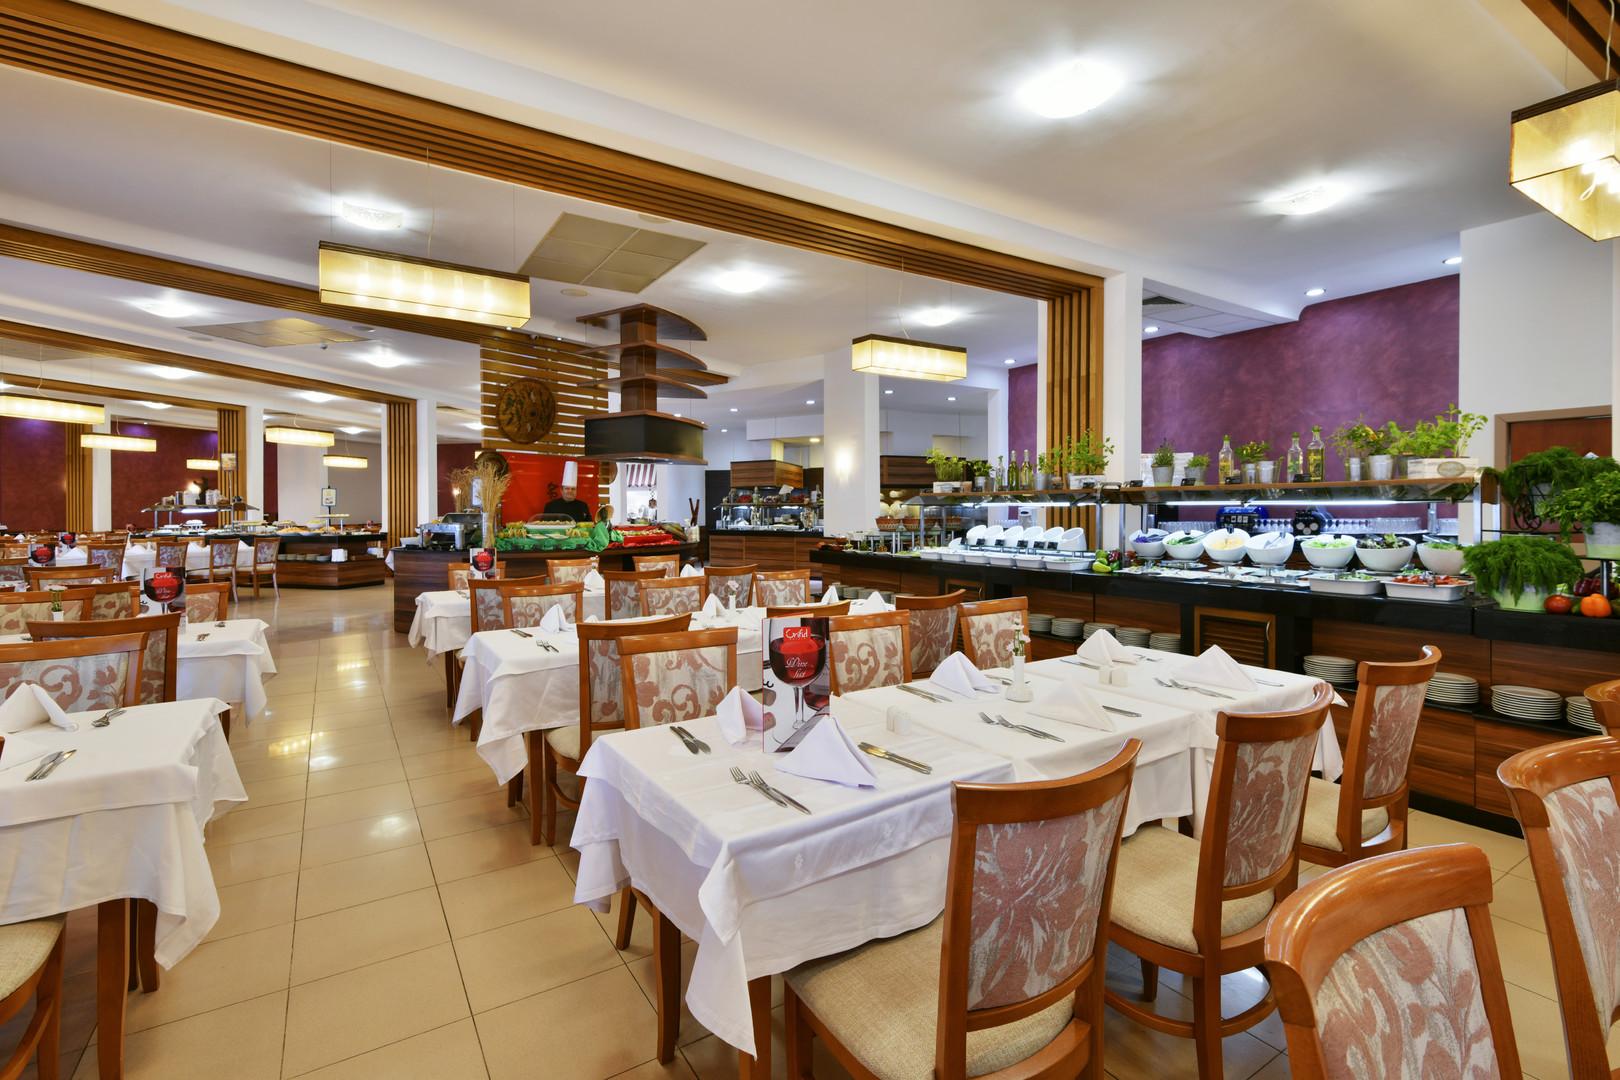 Hotel Grifid Arabella #3